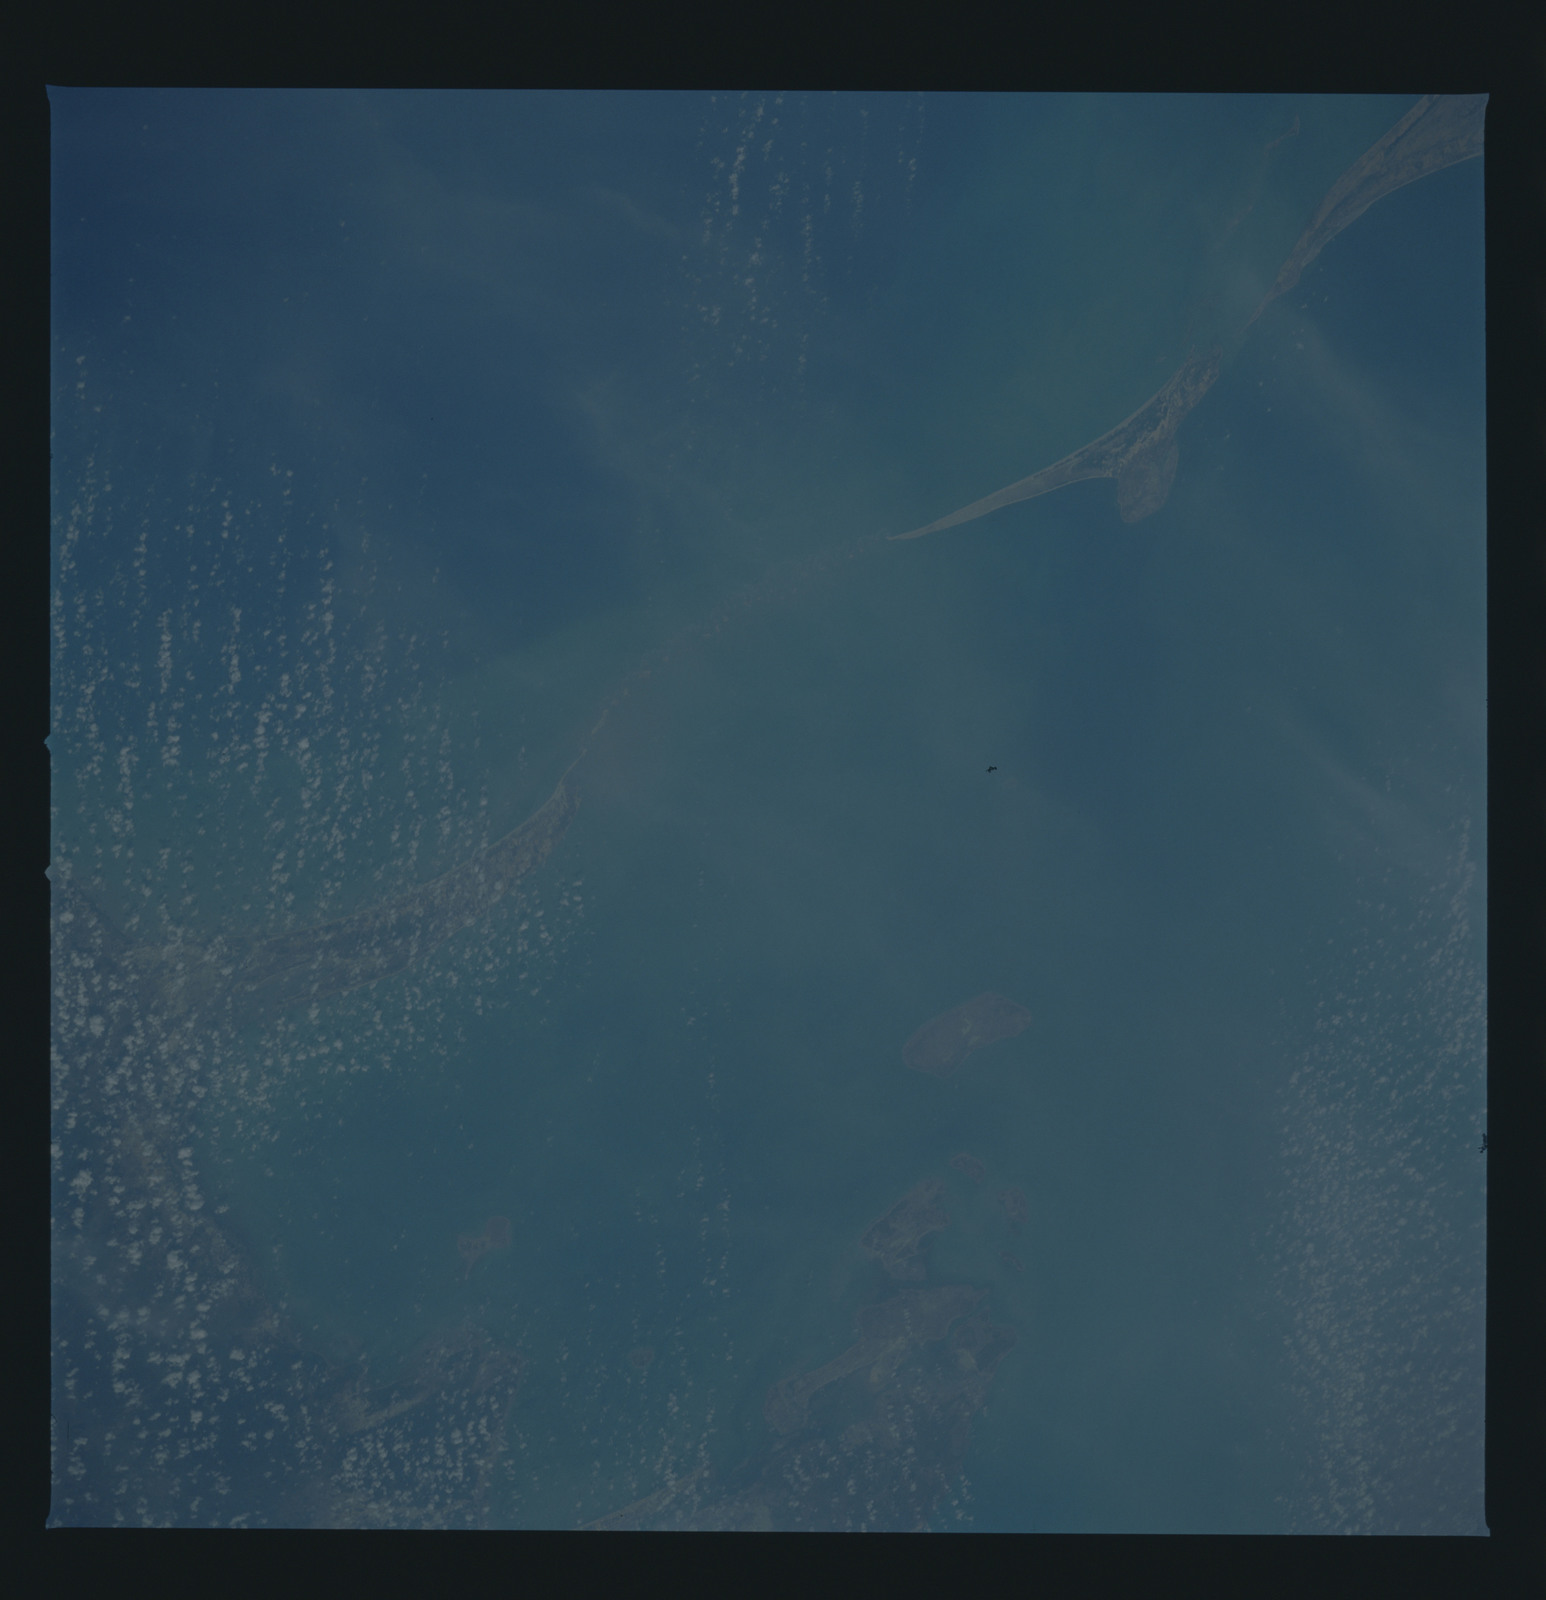 51B-32-060 - STS-51B - 51B earth observation